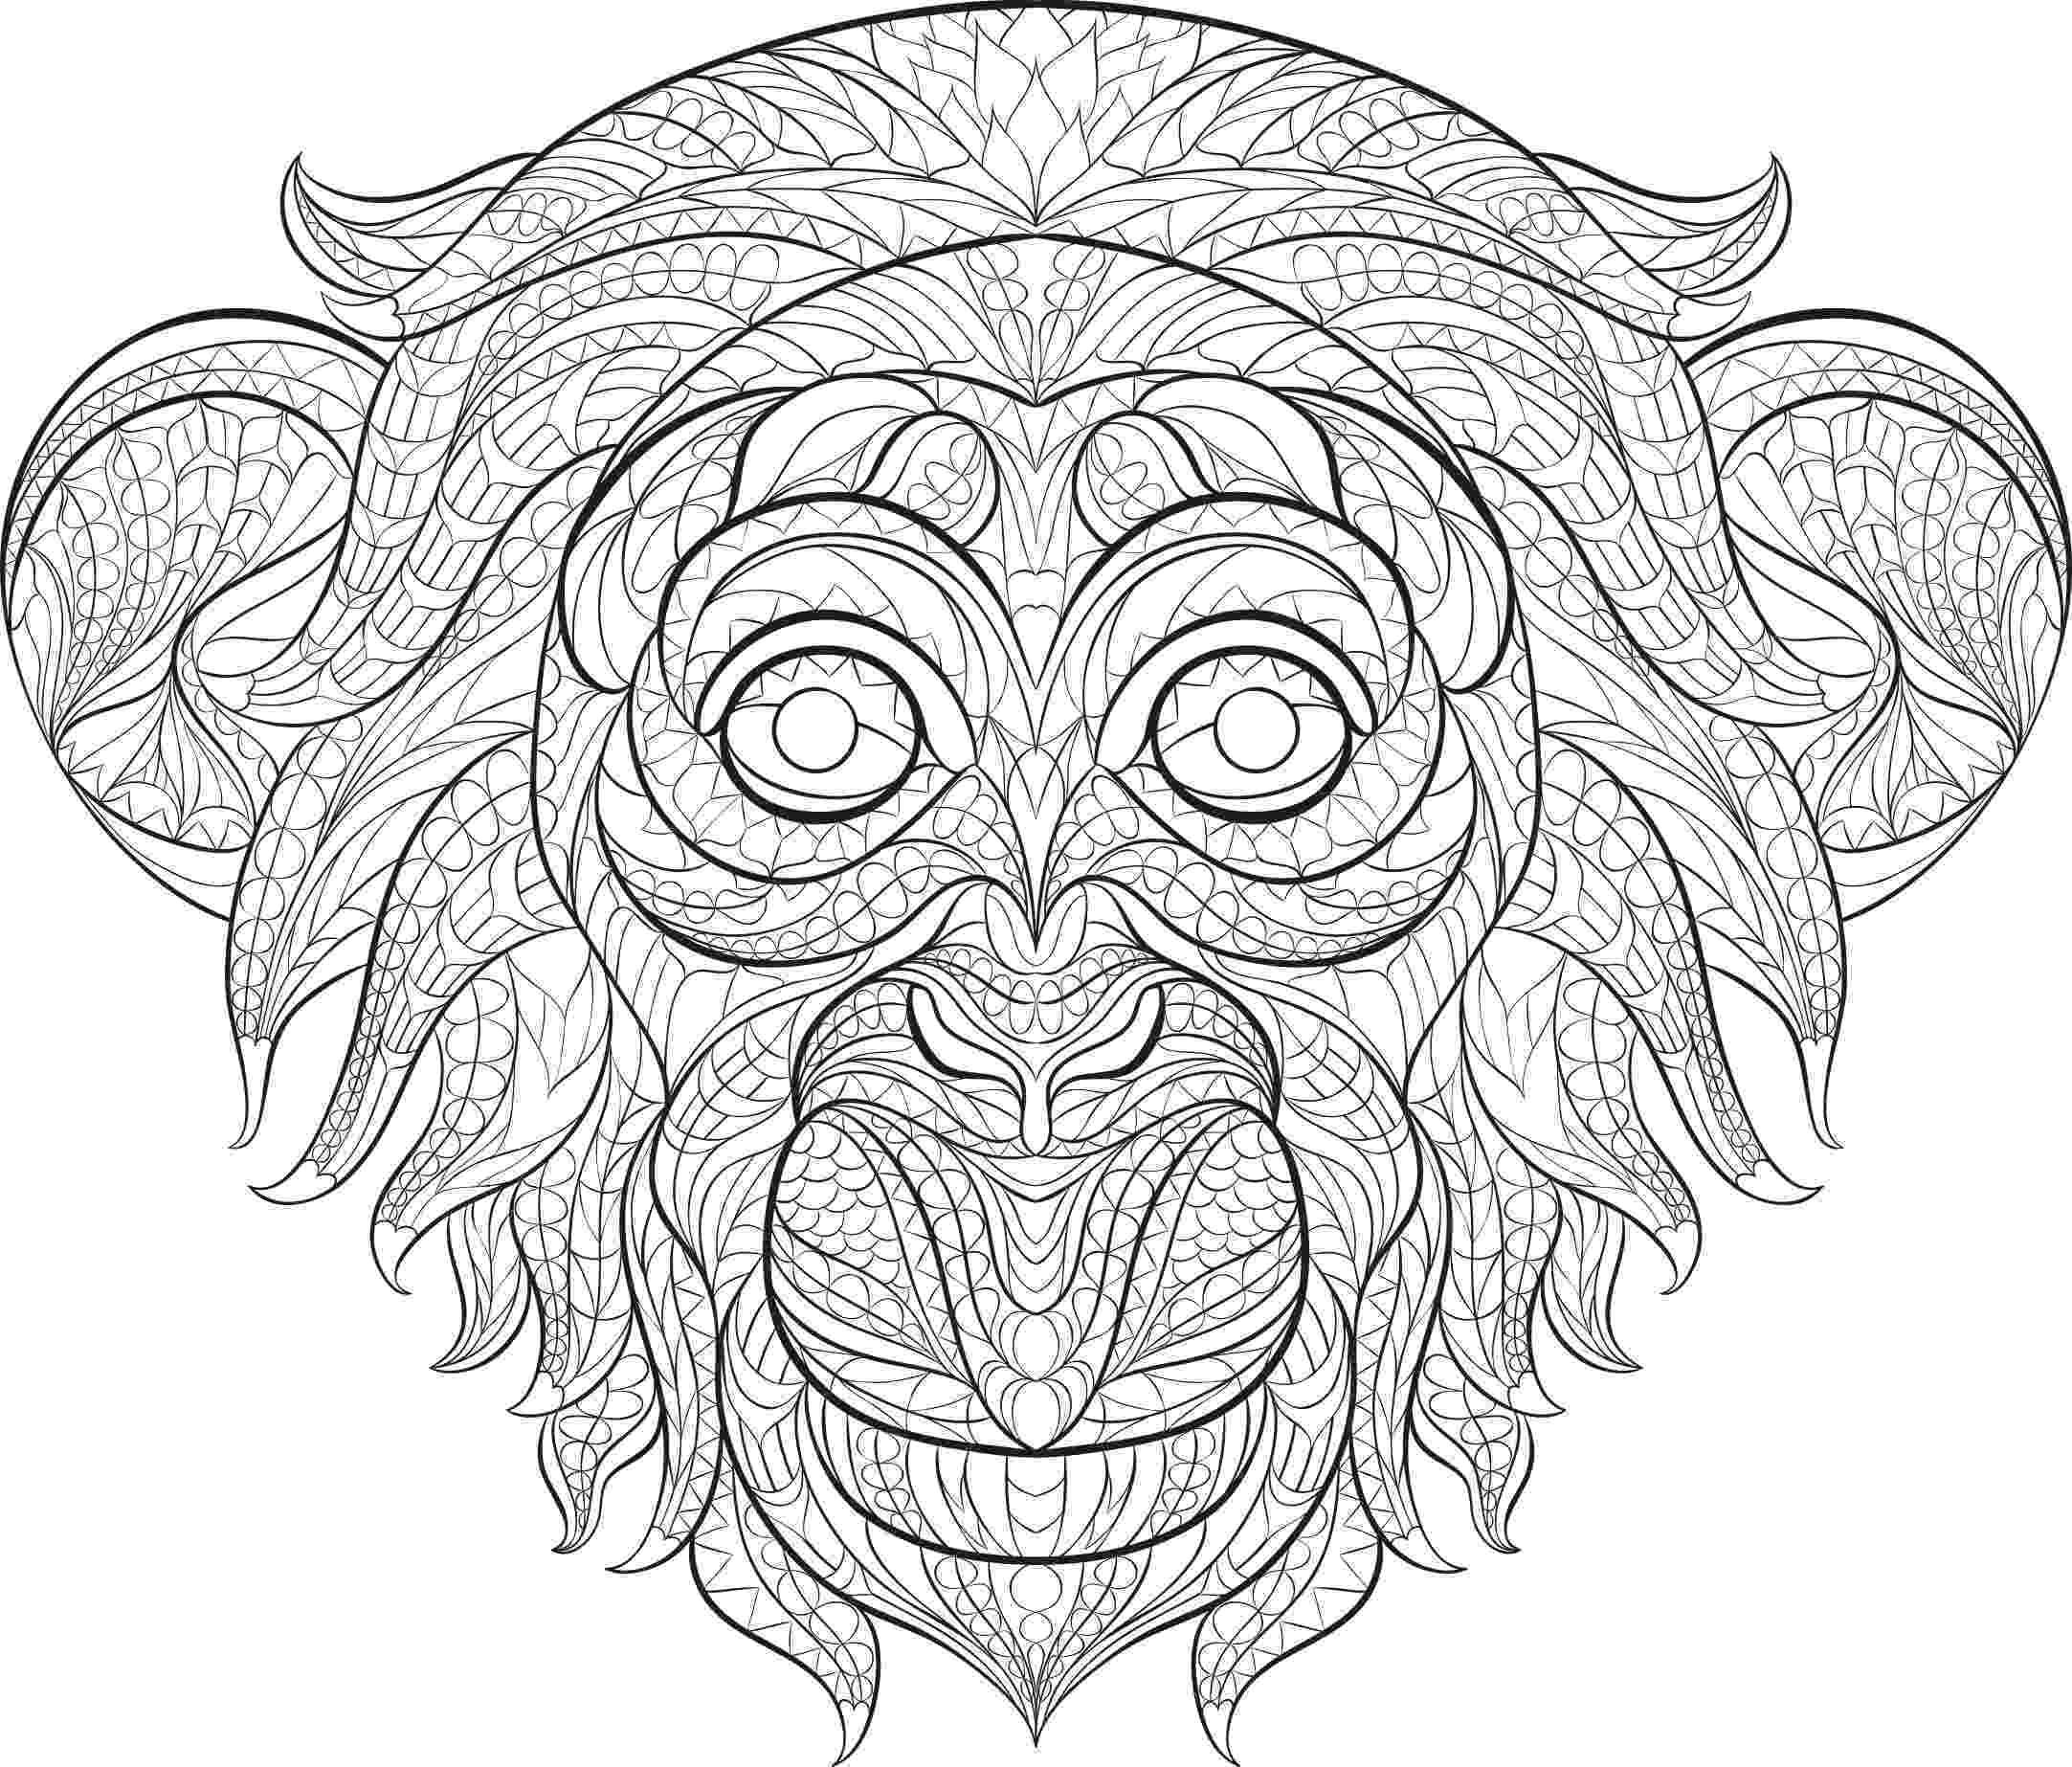 coloring animals monkey free printable monkey coloring pages for kids monkey animals coloring